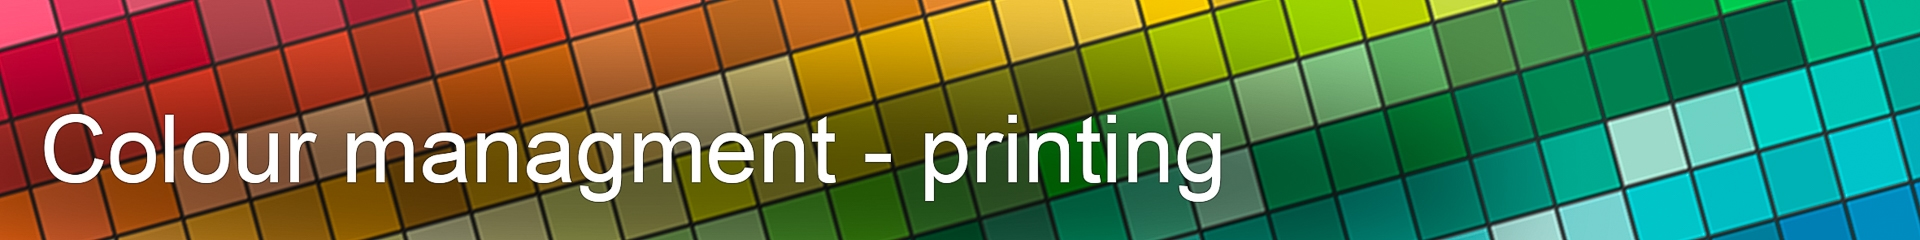 Img - 01 - printing